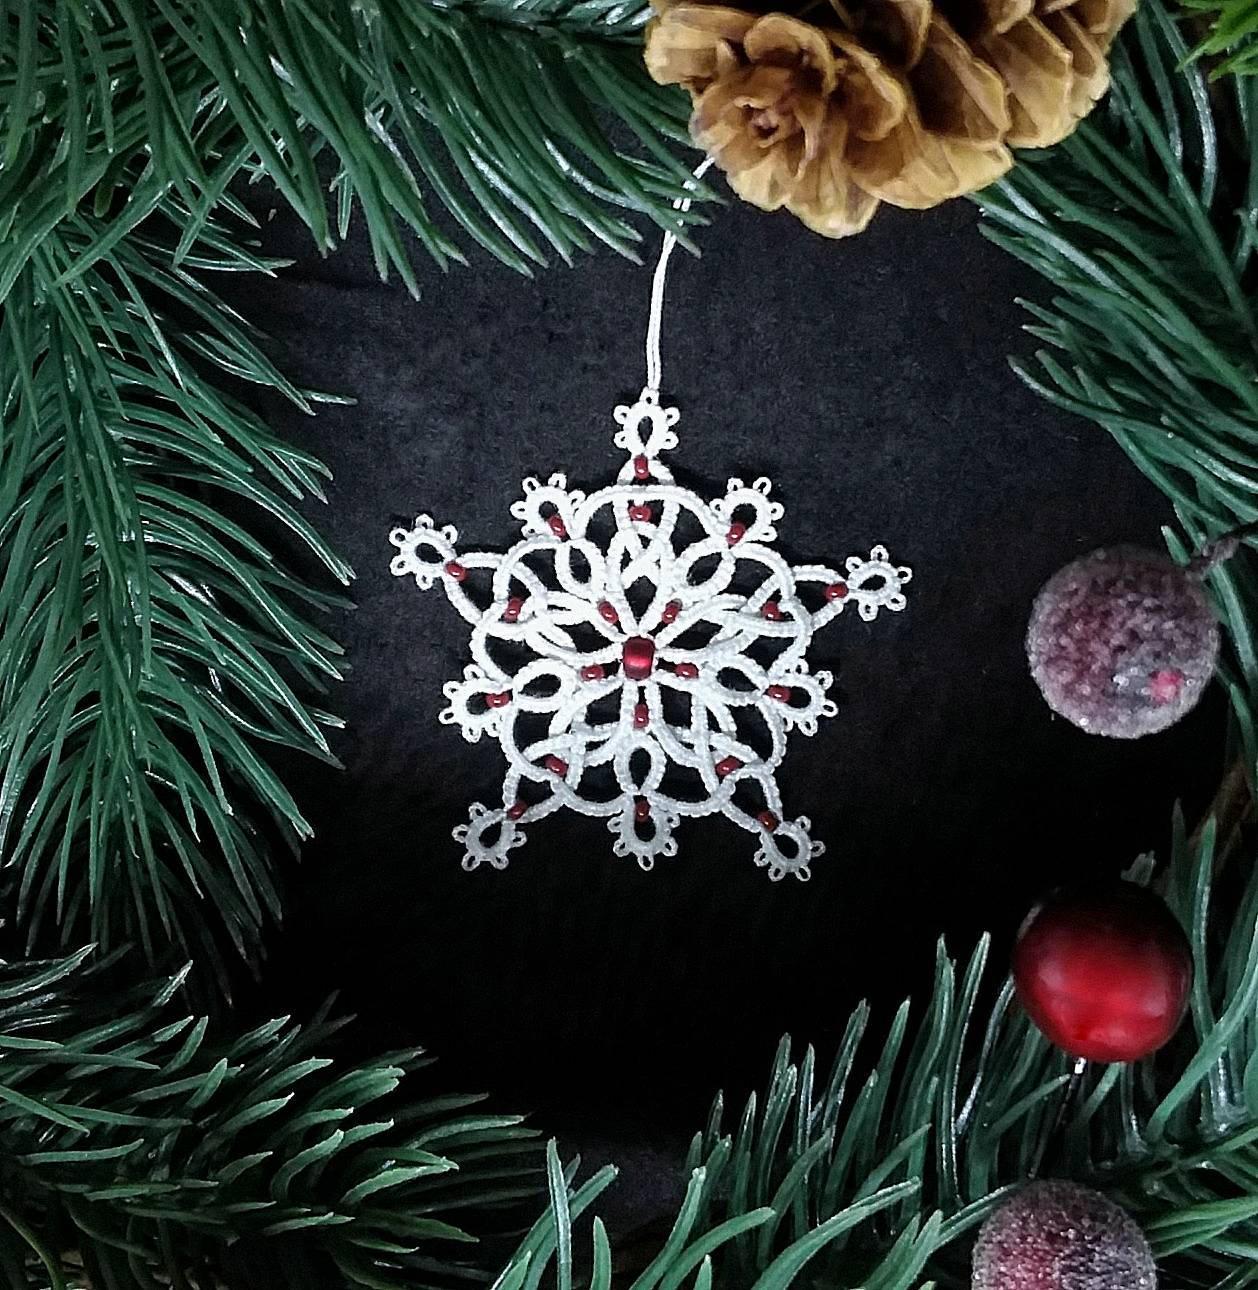 celtic christmas tree decoration christmas ornament snowflake star white cotton red glass beads handmade tatting lace christmas gift - Celtic Christmas